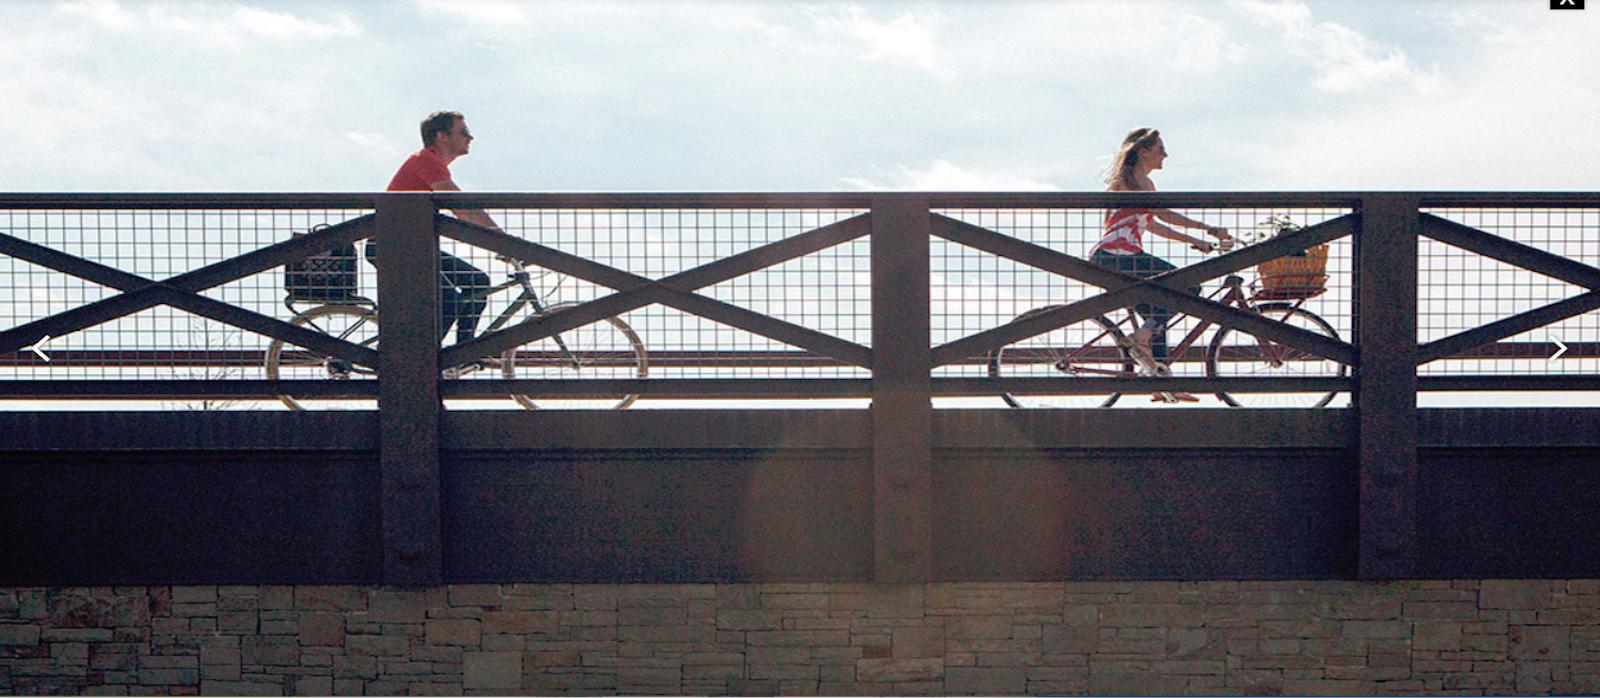 light-farms-community-biking-texas